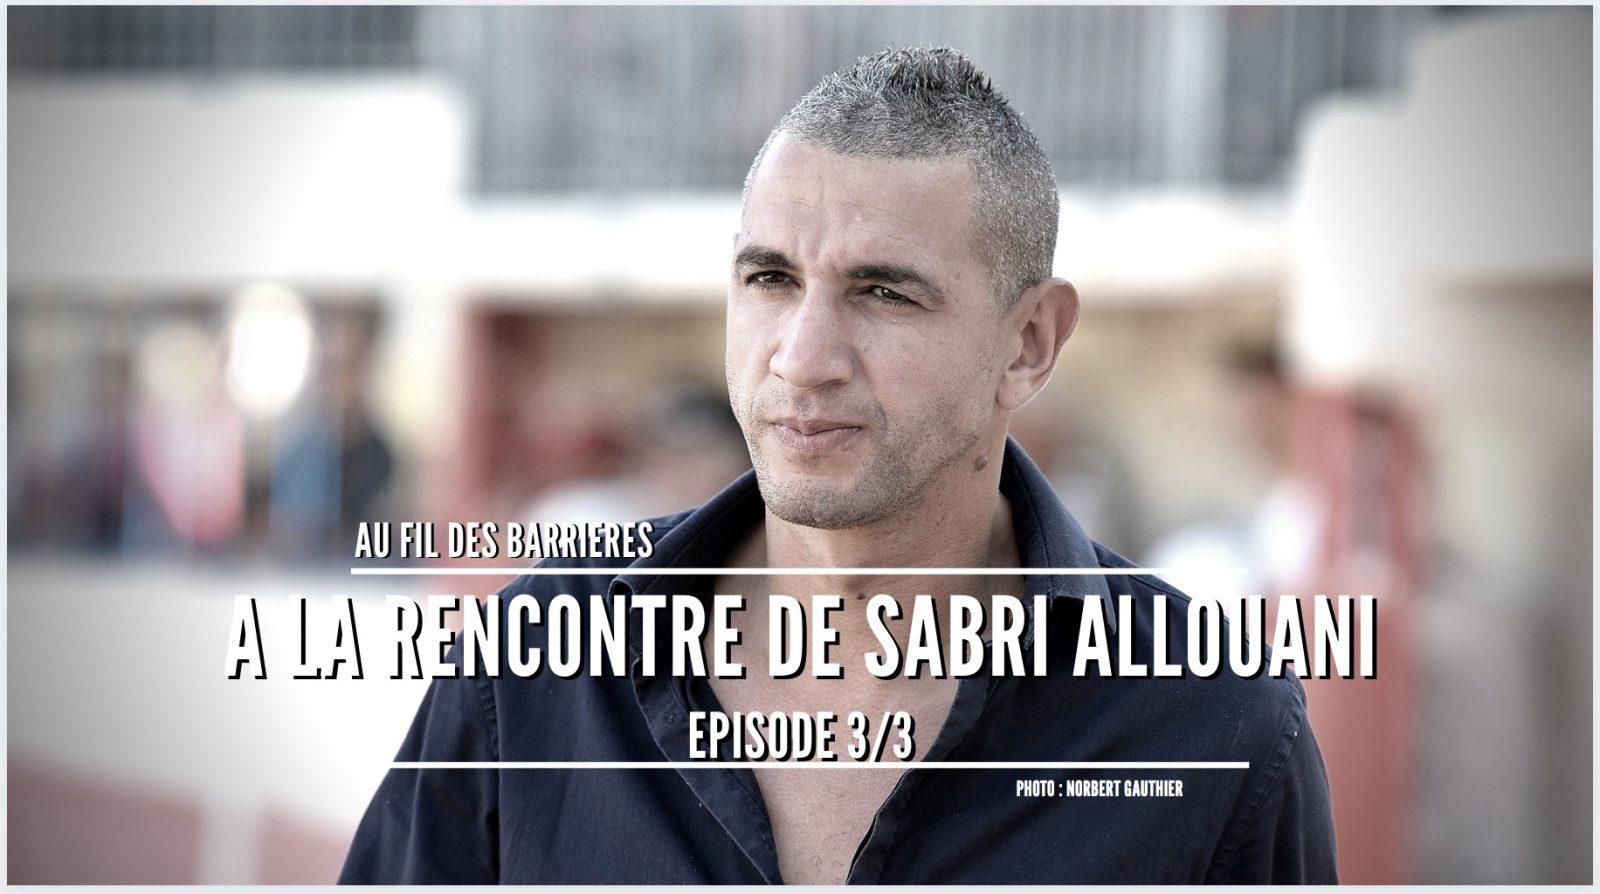 VIDEO // A la rencontre de Sabri Allouani – Episode 3/3